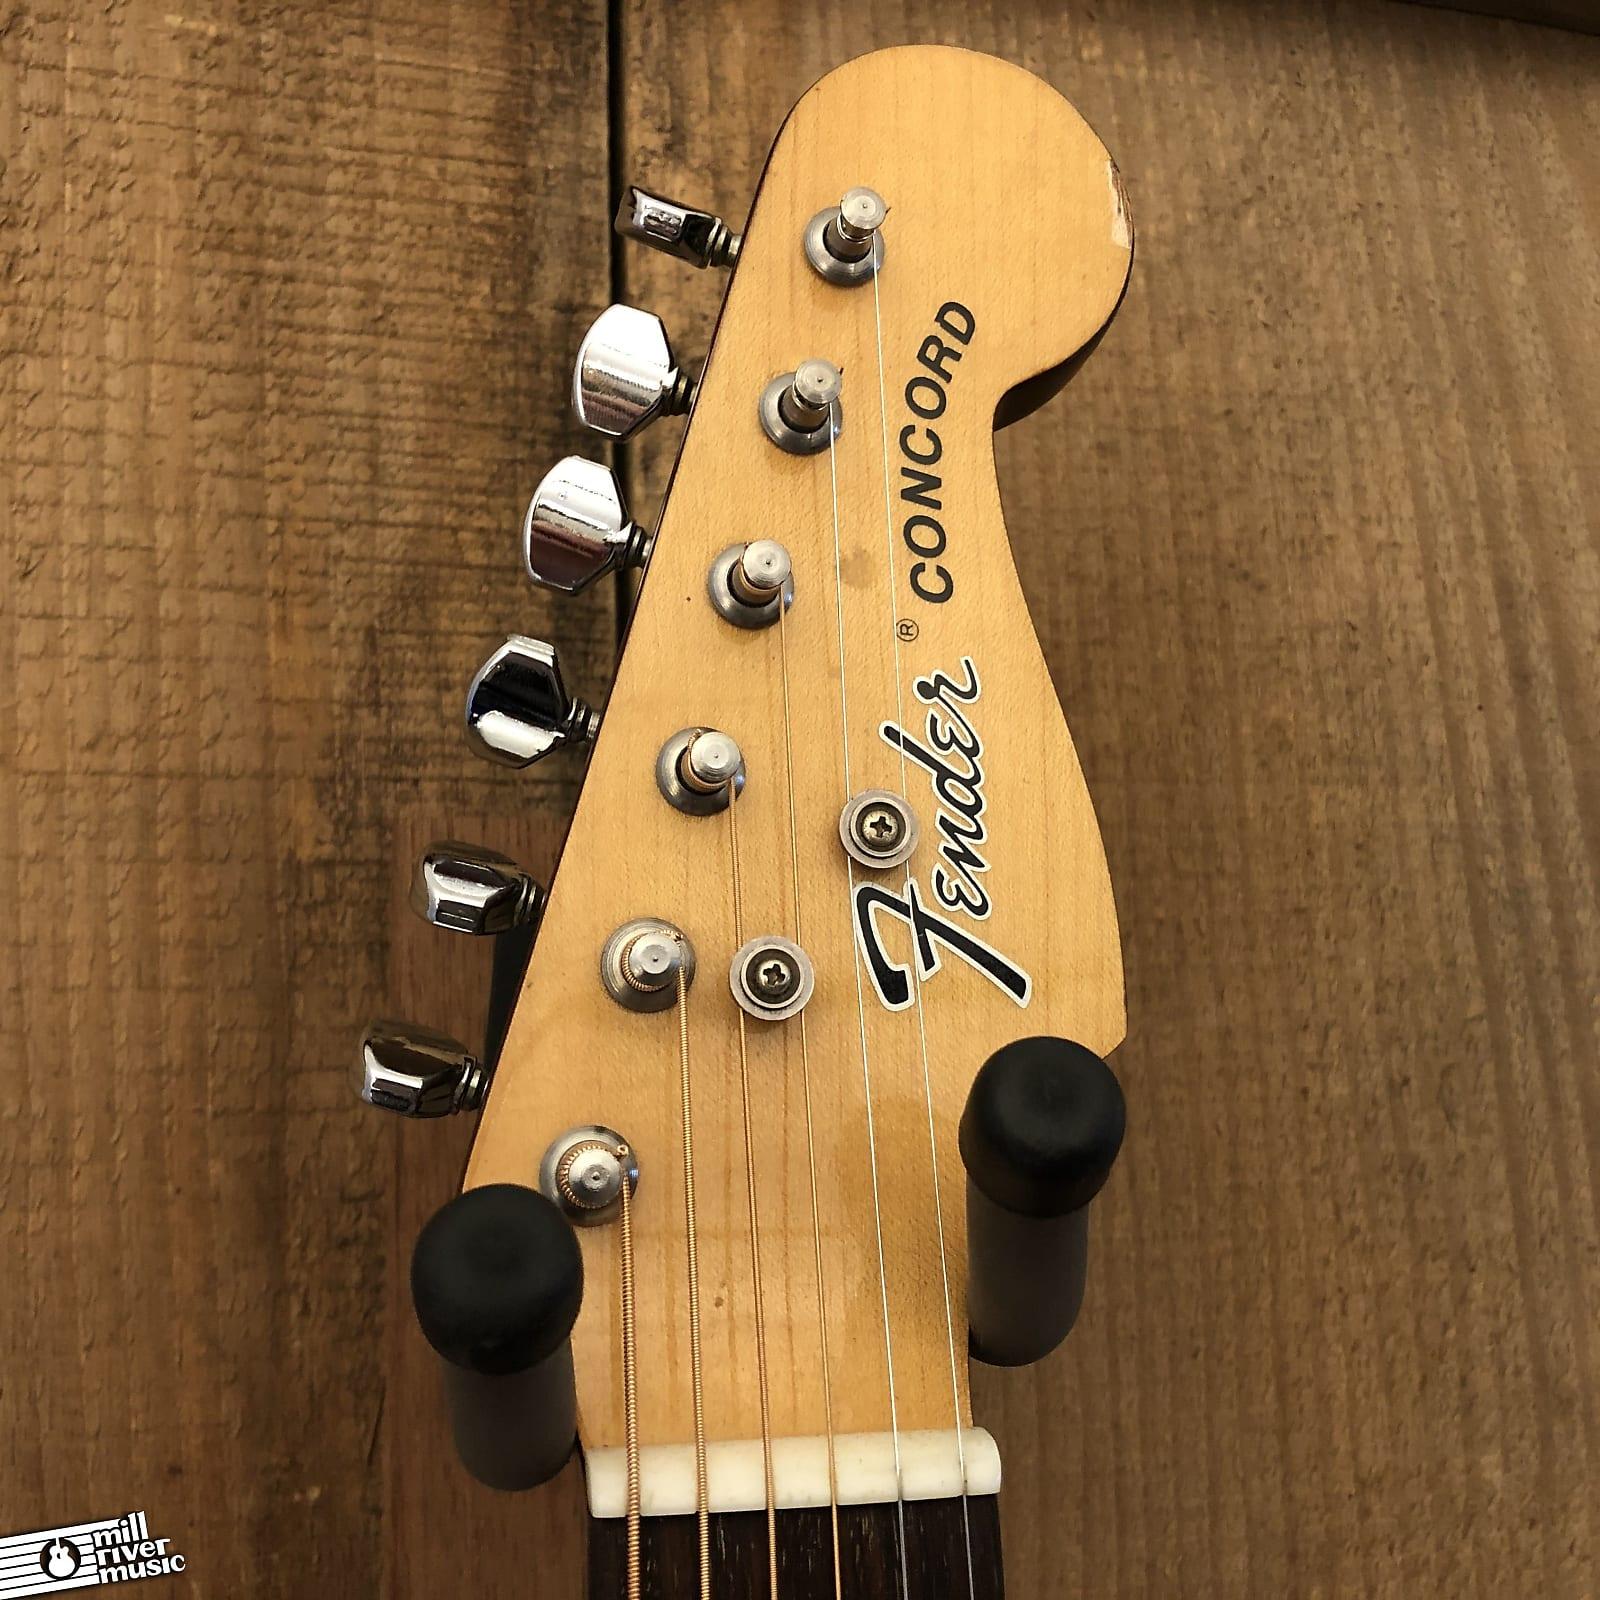 Fender Concord II Vintage MIK Dreadnought Natural c. 1980s-90s w/ Case Korea